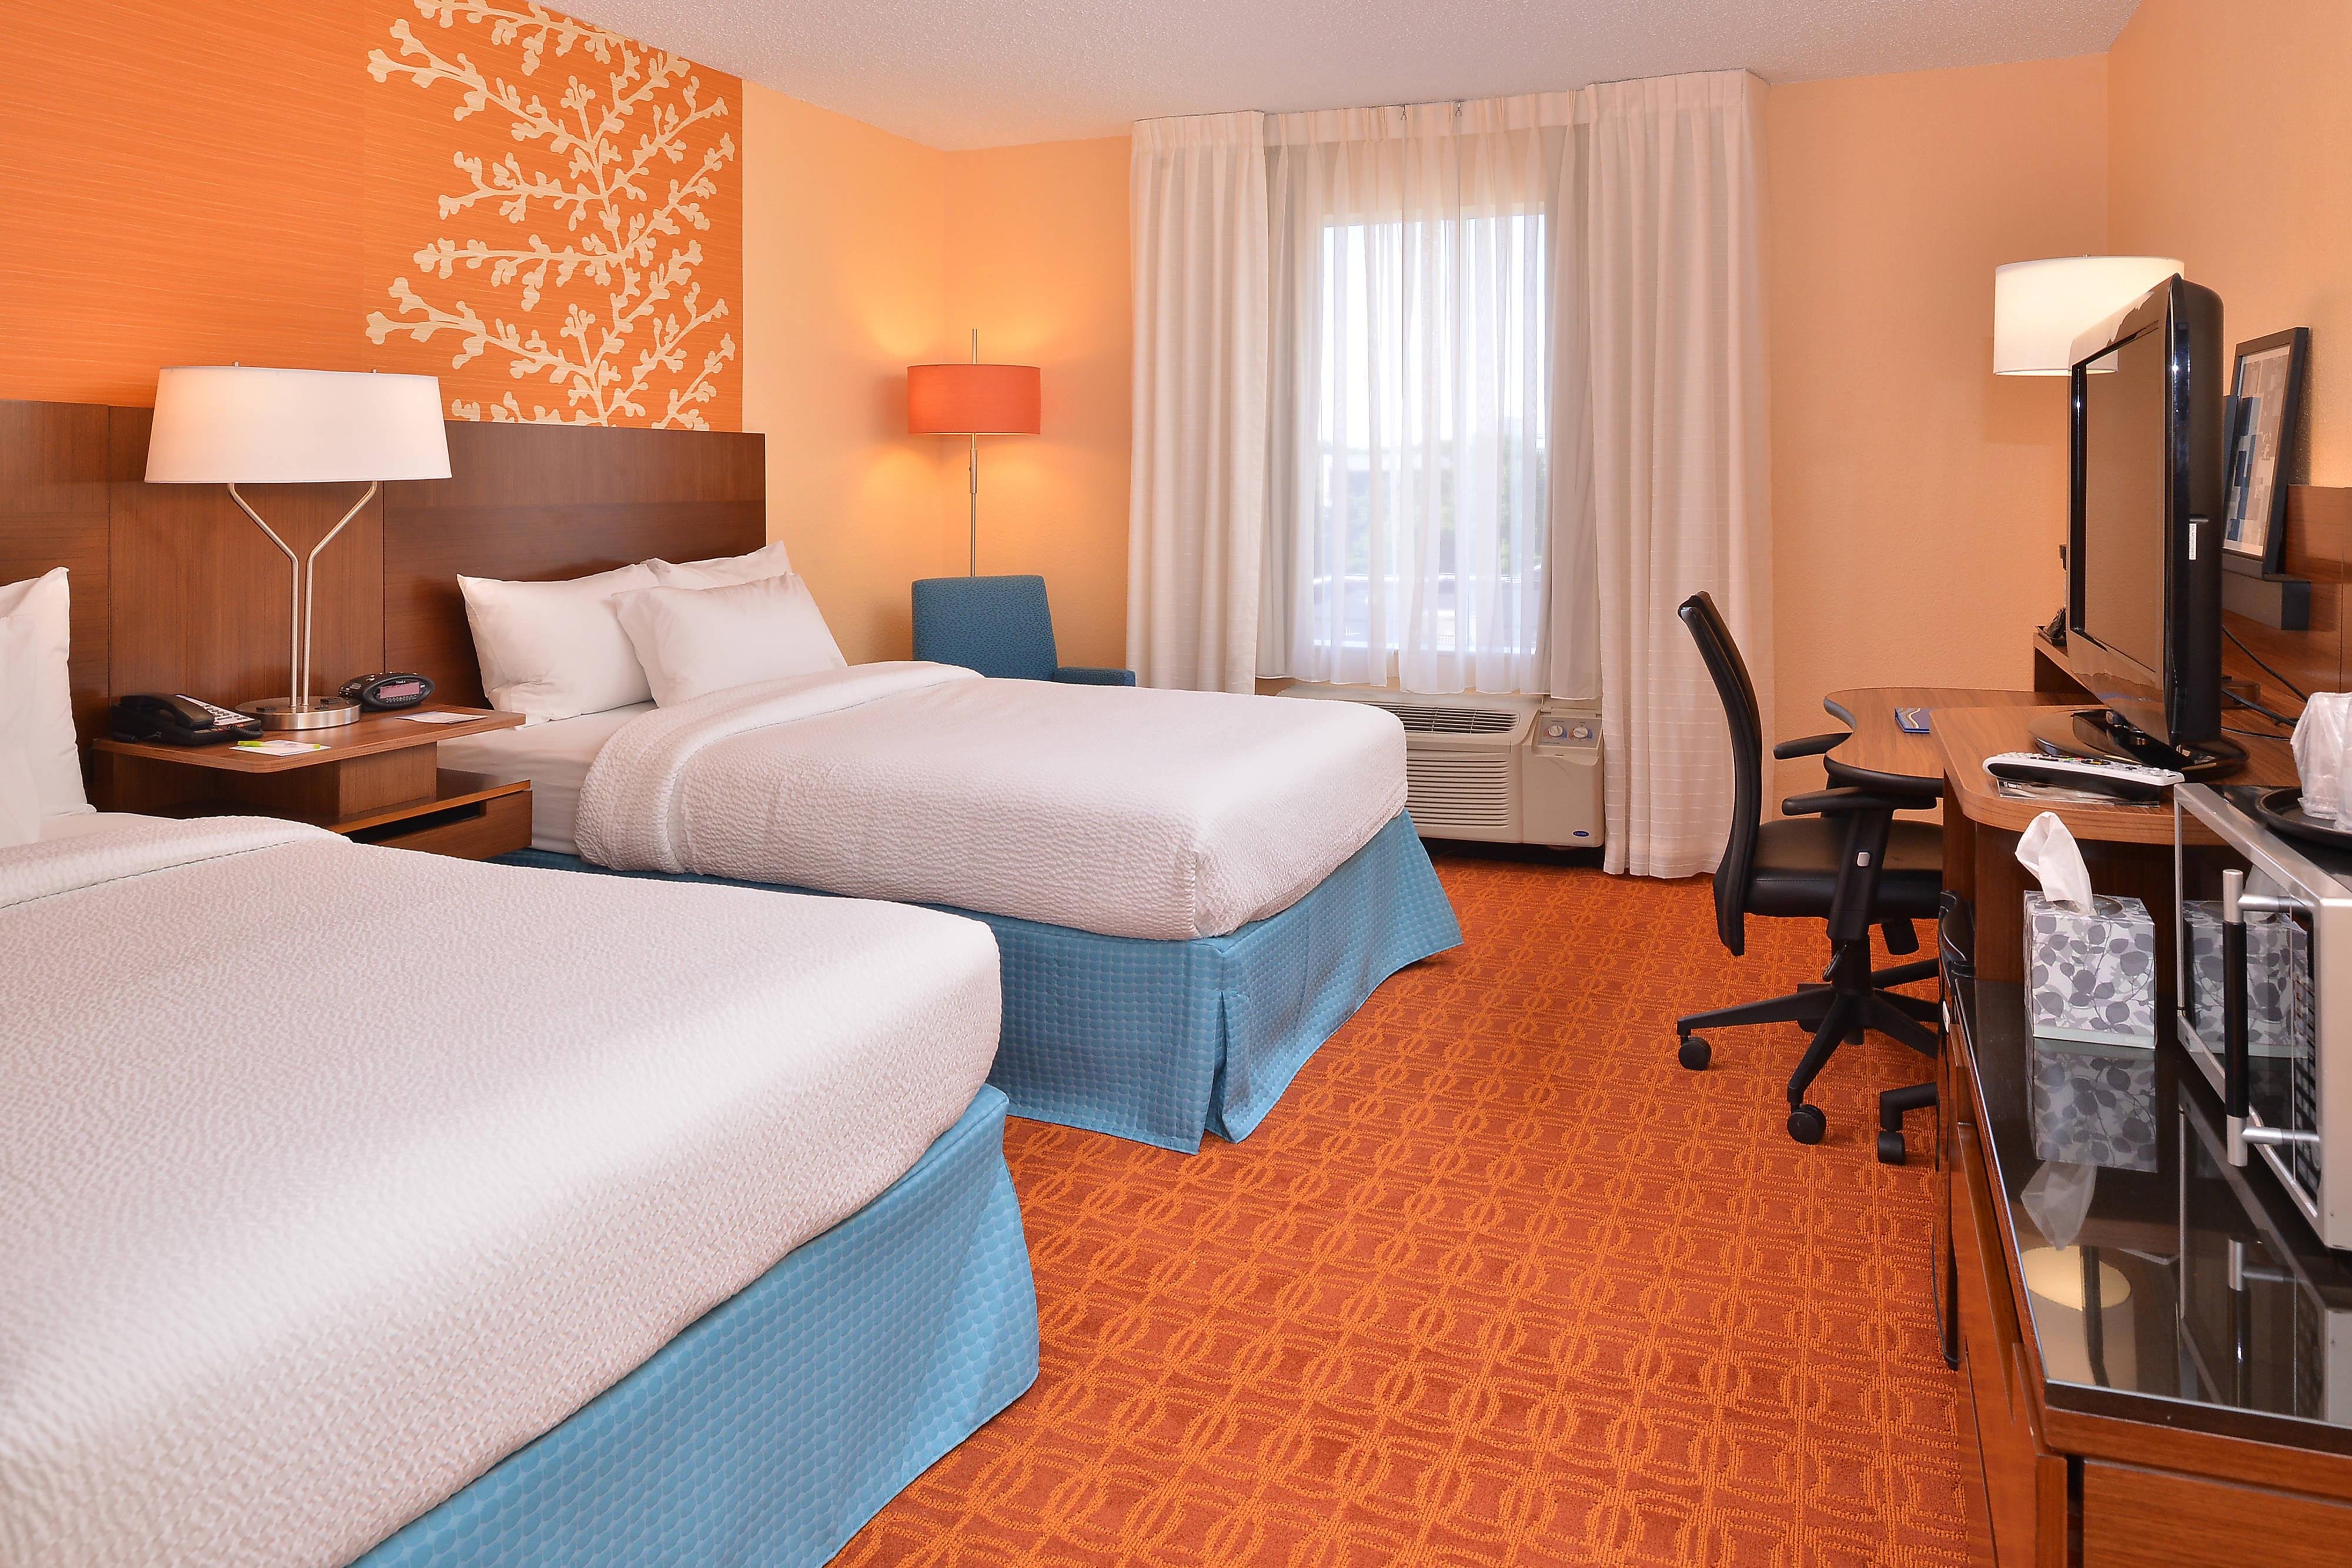 hotel rooms and suites in mt laurel nj ada accessible. Black Bedroom Furniture Sets. Home Design Ideas